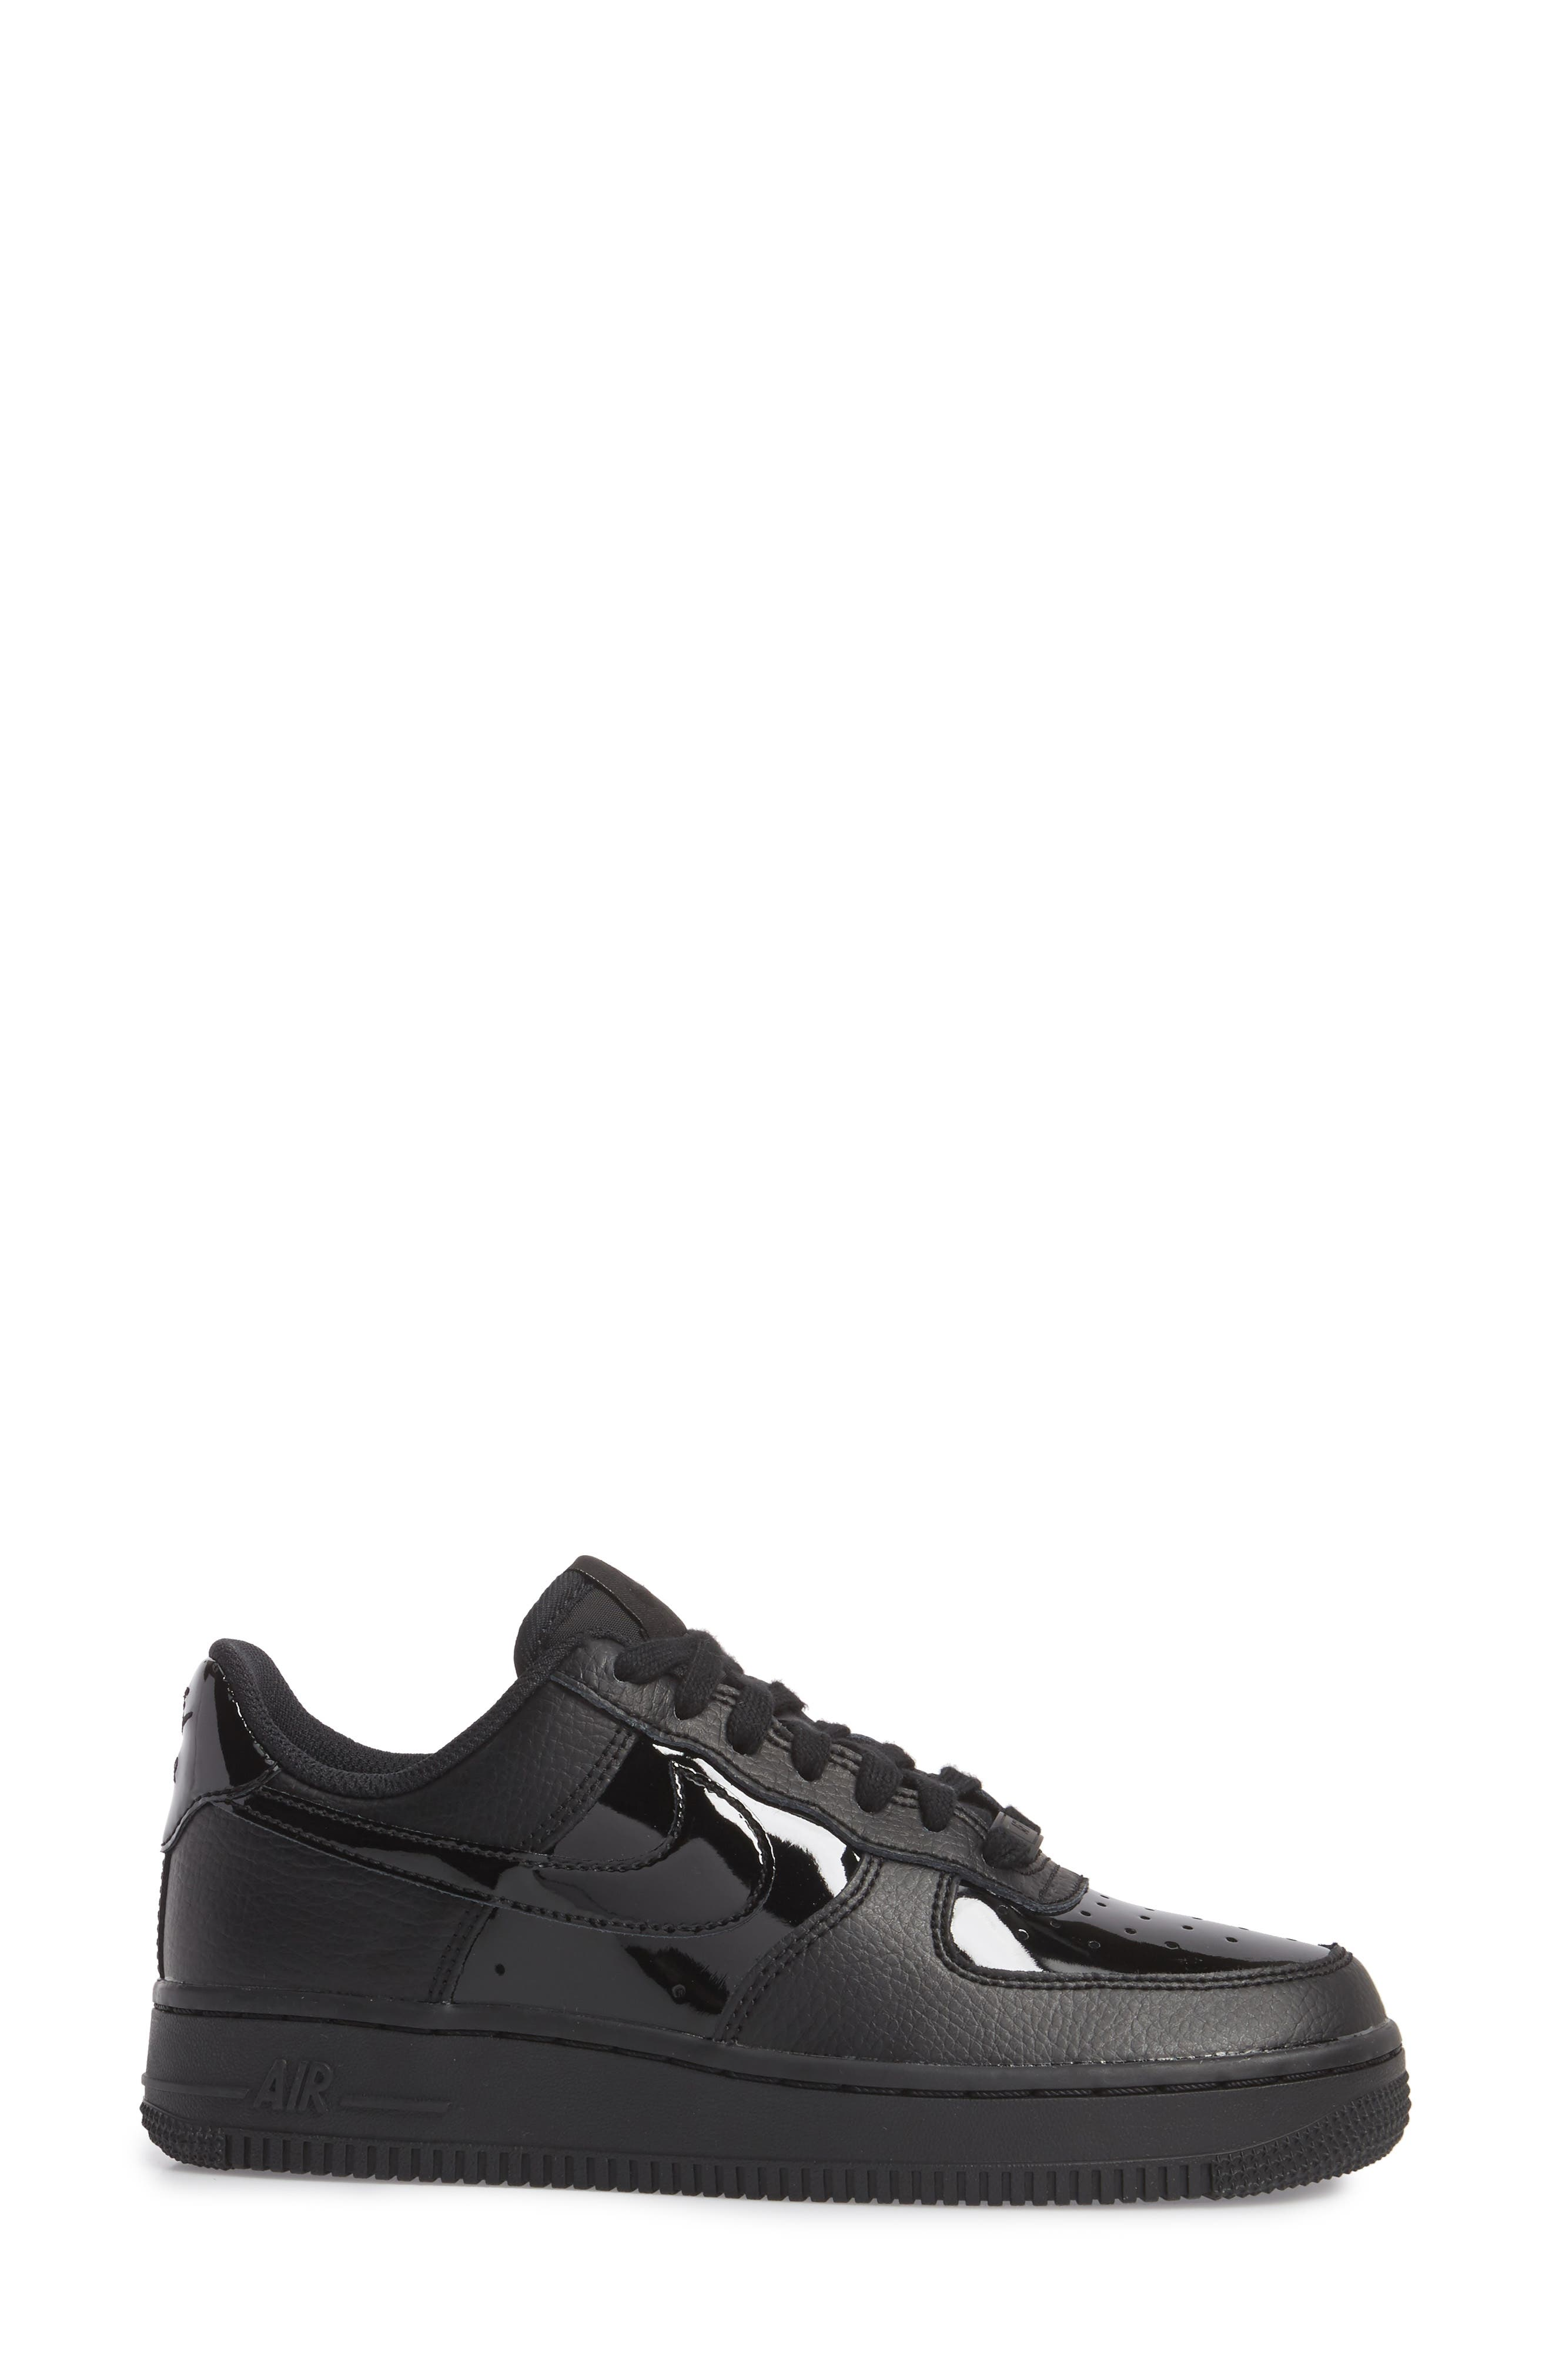 Air Force 1 '07 Sneaker,                             Alternate thumbnail 3, color,                             001